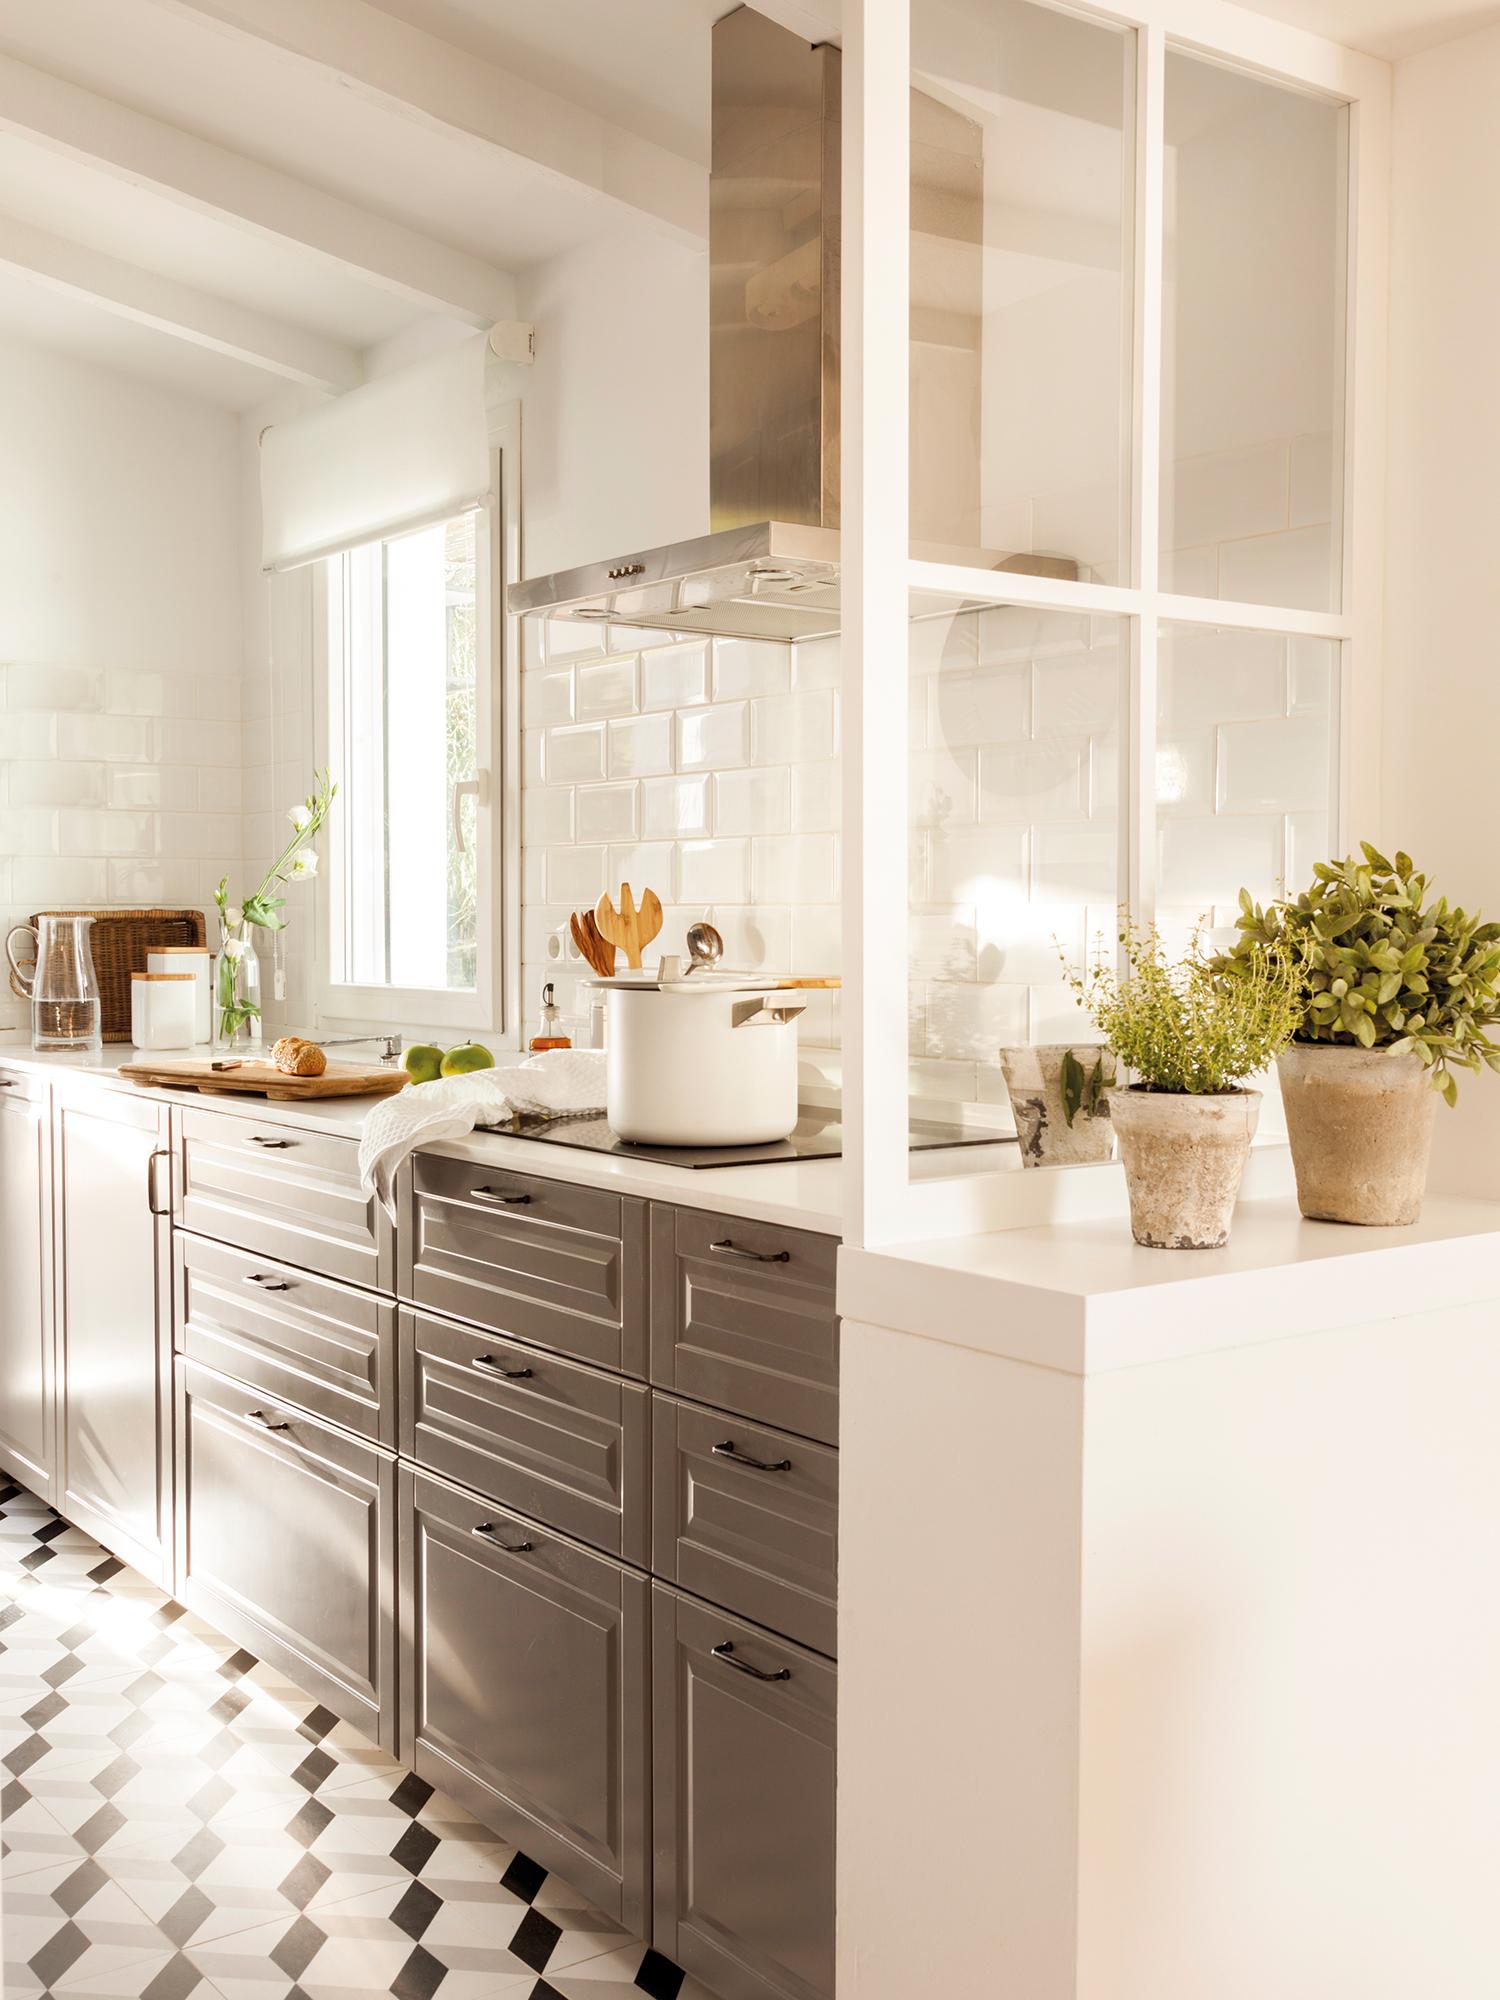 Cocinas peque as distribuidas en paralelo for Muebles de cocina gris